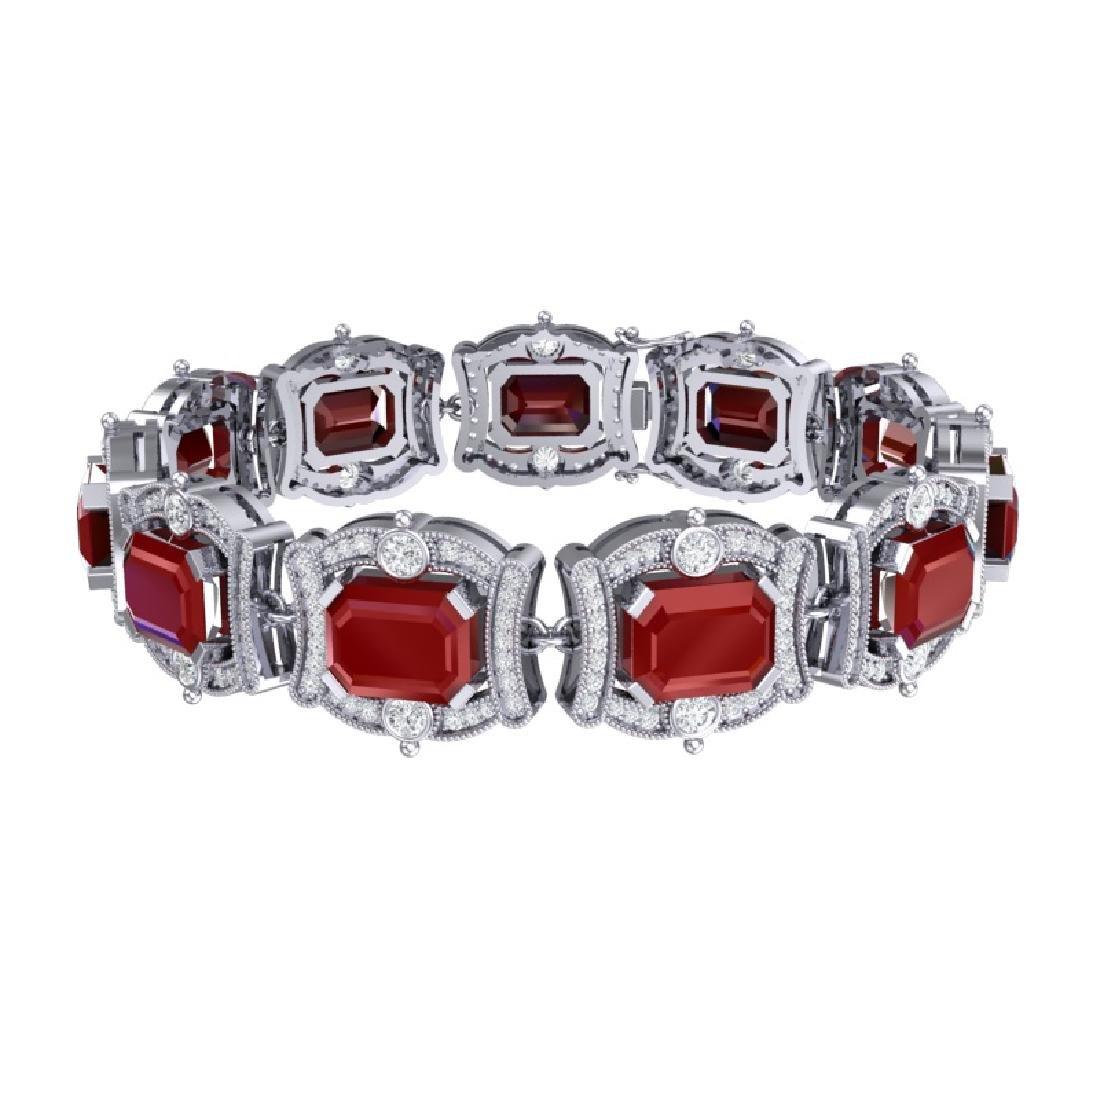 43.87 CTW Royalty Ruby & VS Diamond Bracelet 18K White - 3